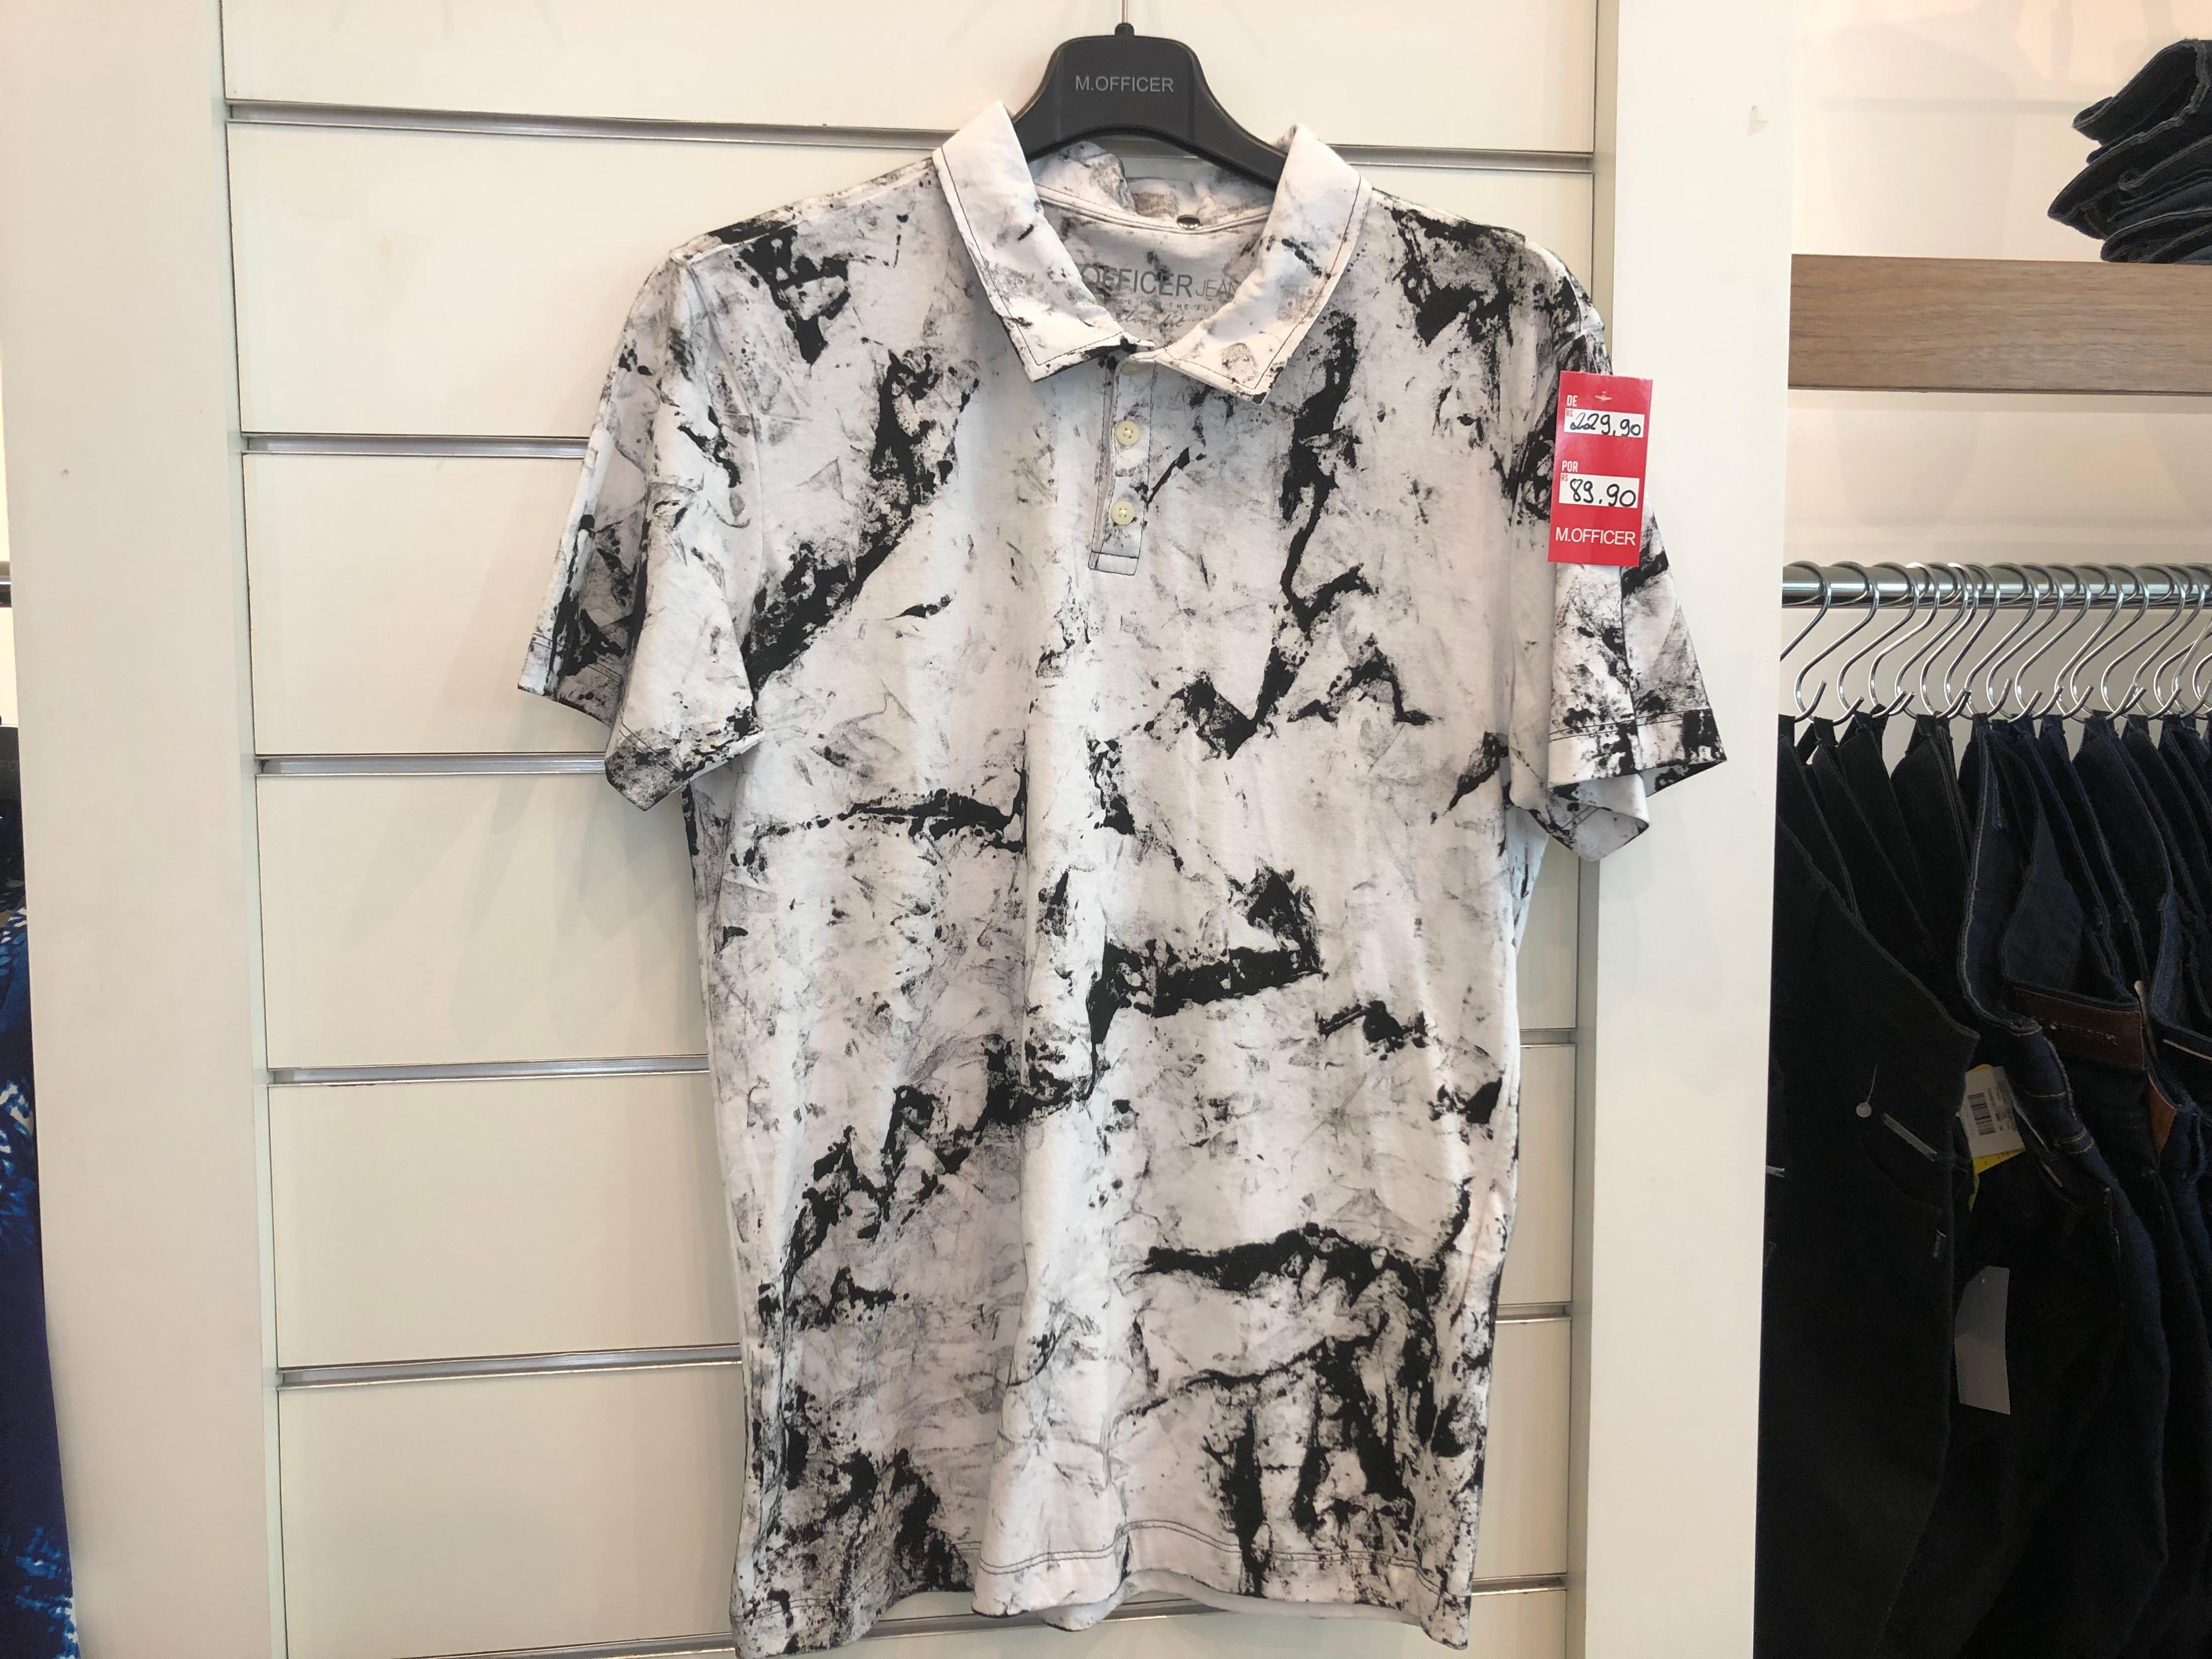 Camisa Polo branca e preta (M.Officer - Salvador Shopping) de R$ 229,9 por R$ 89,9 (60,8%)